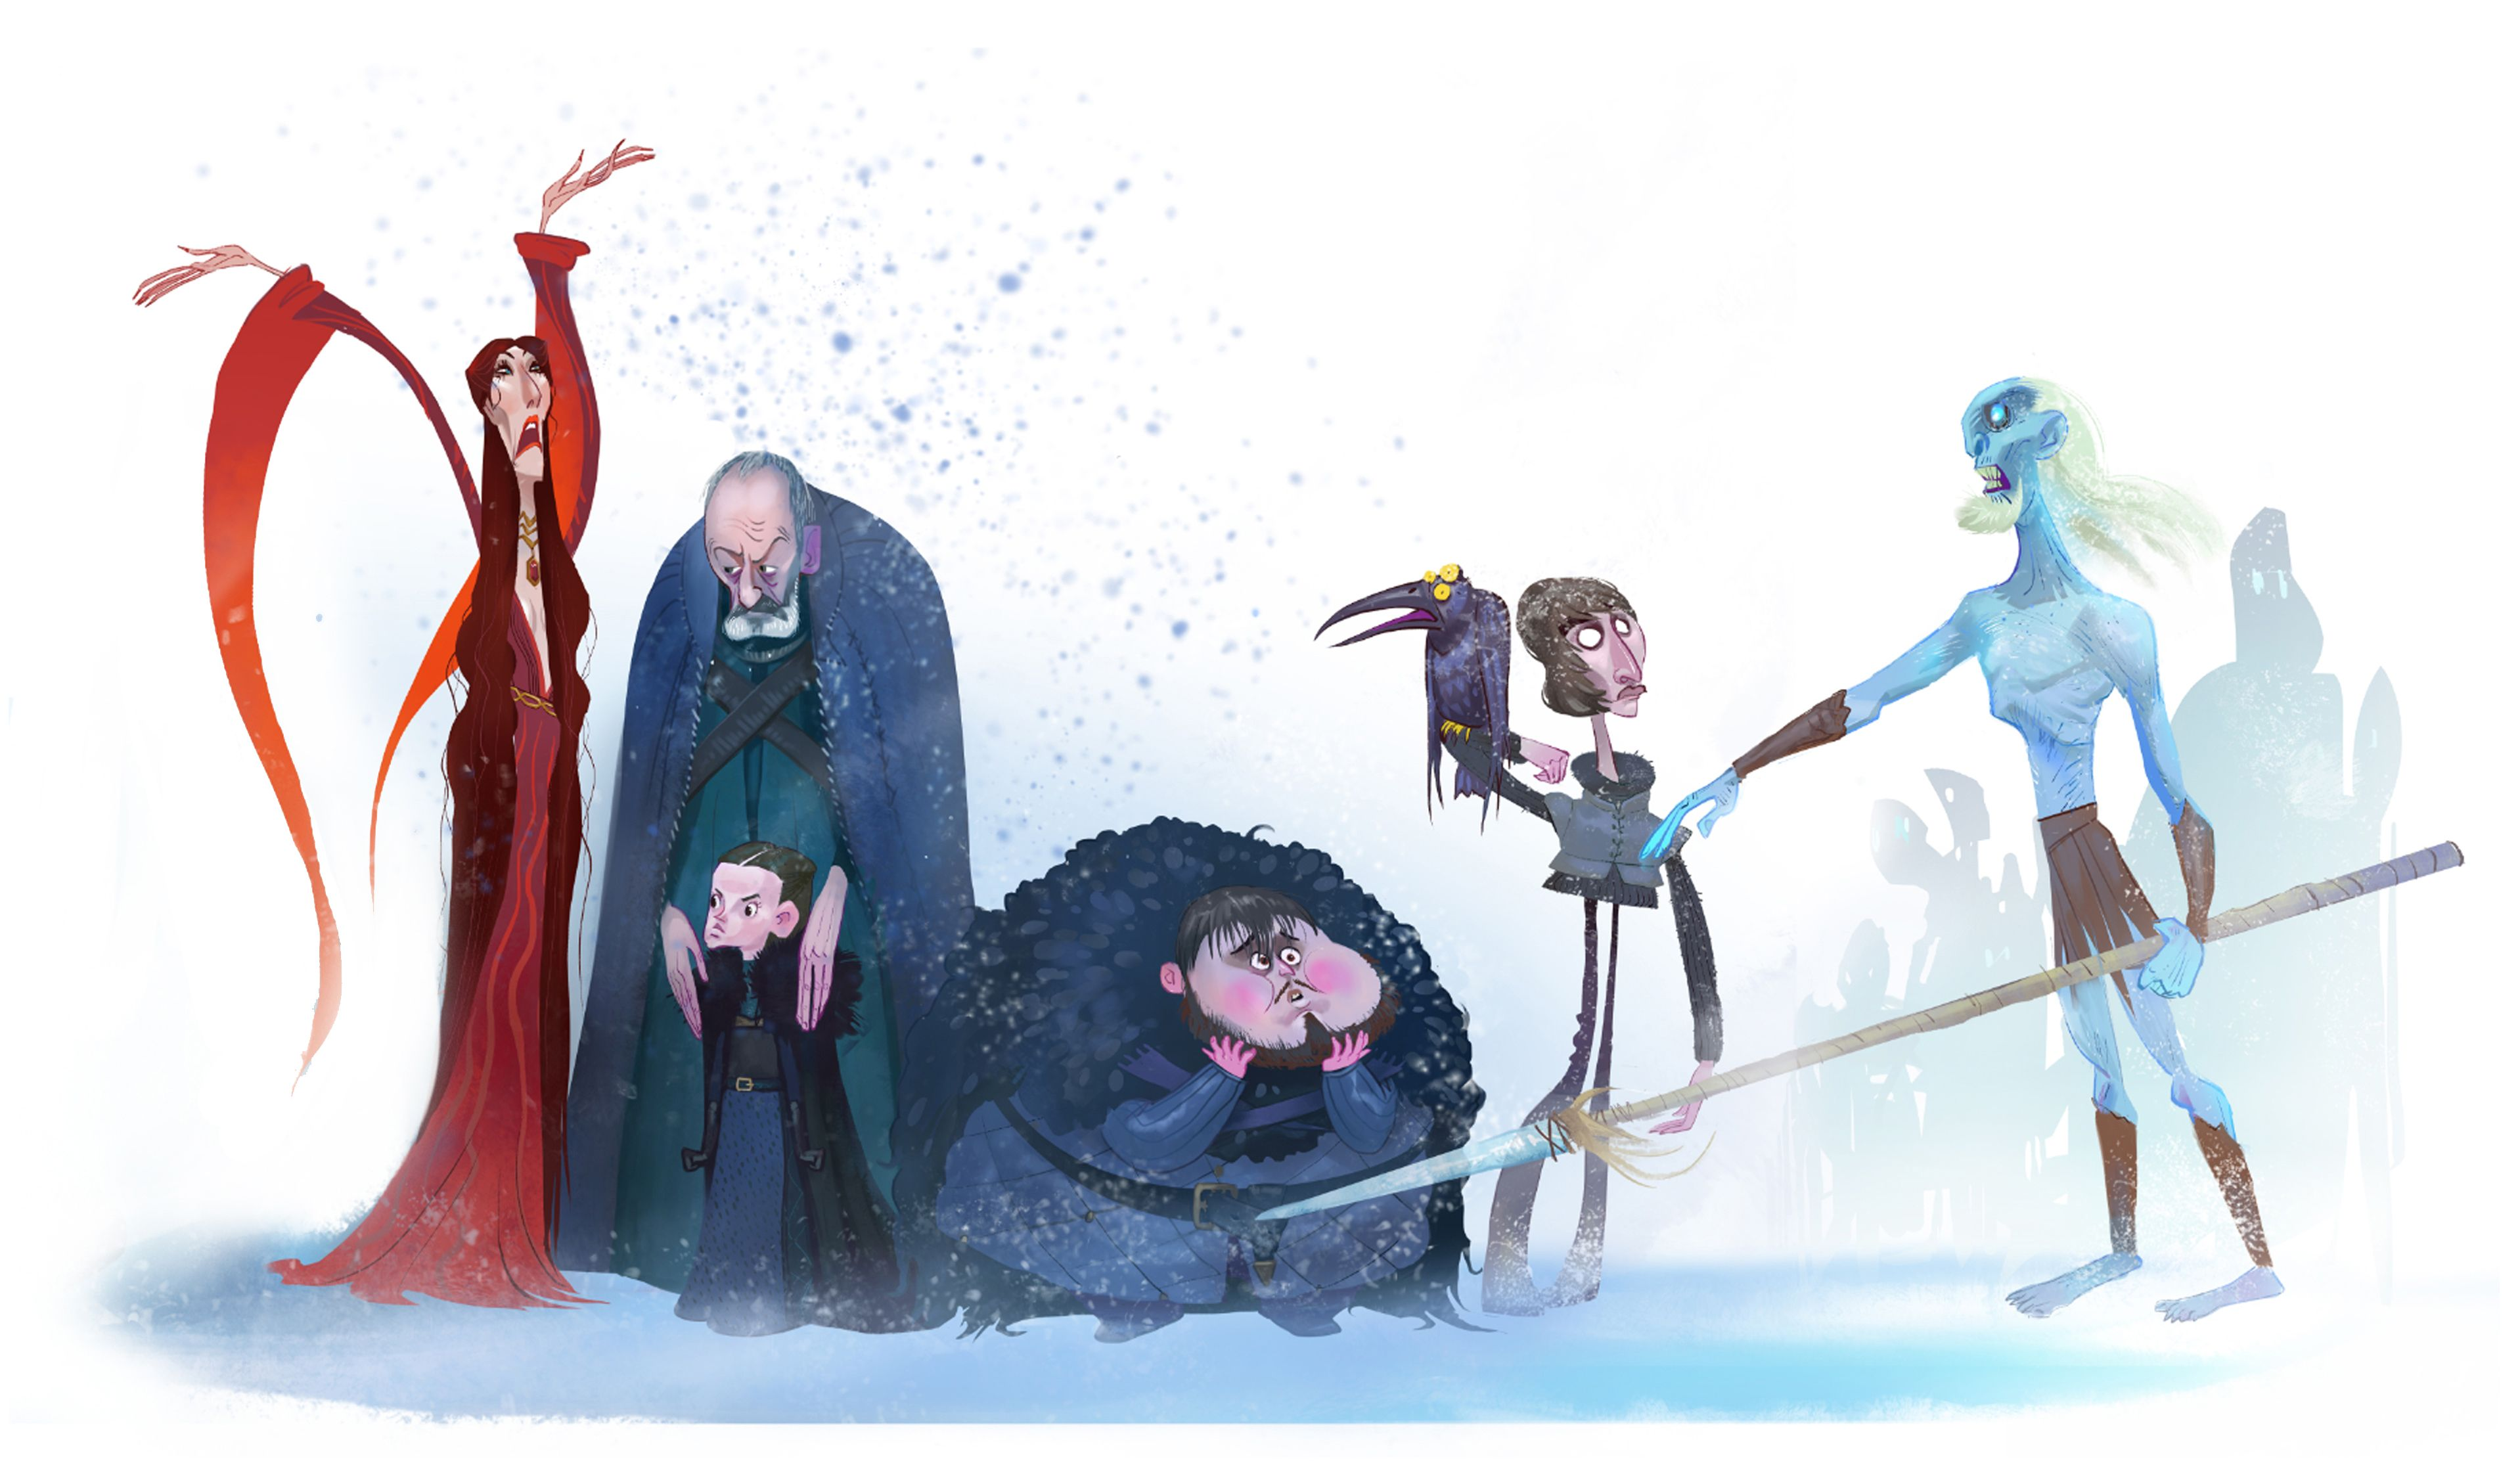 Animation Character Design Portfolio : Game of thrones behance portfolio editor